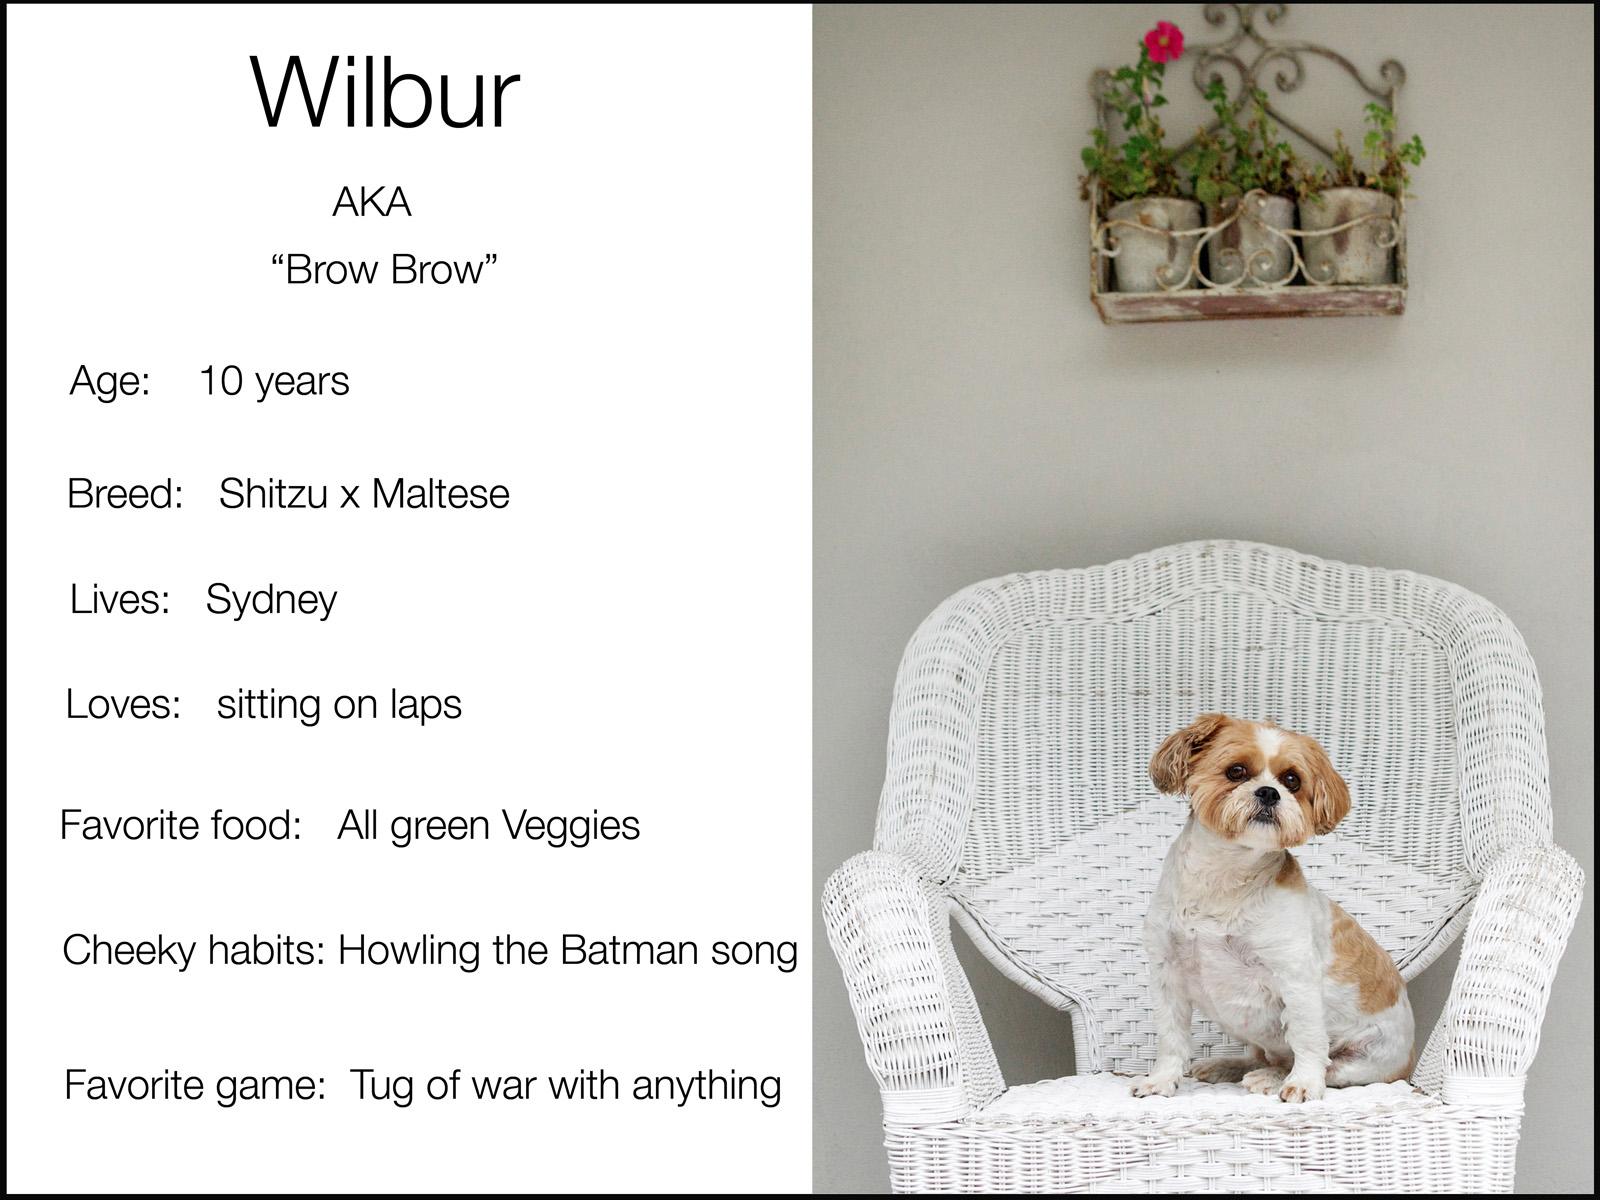 Black wilour blurb copy